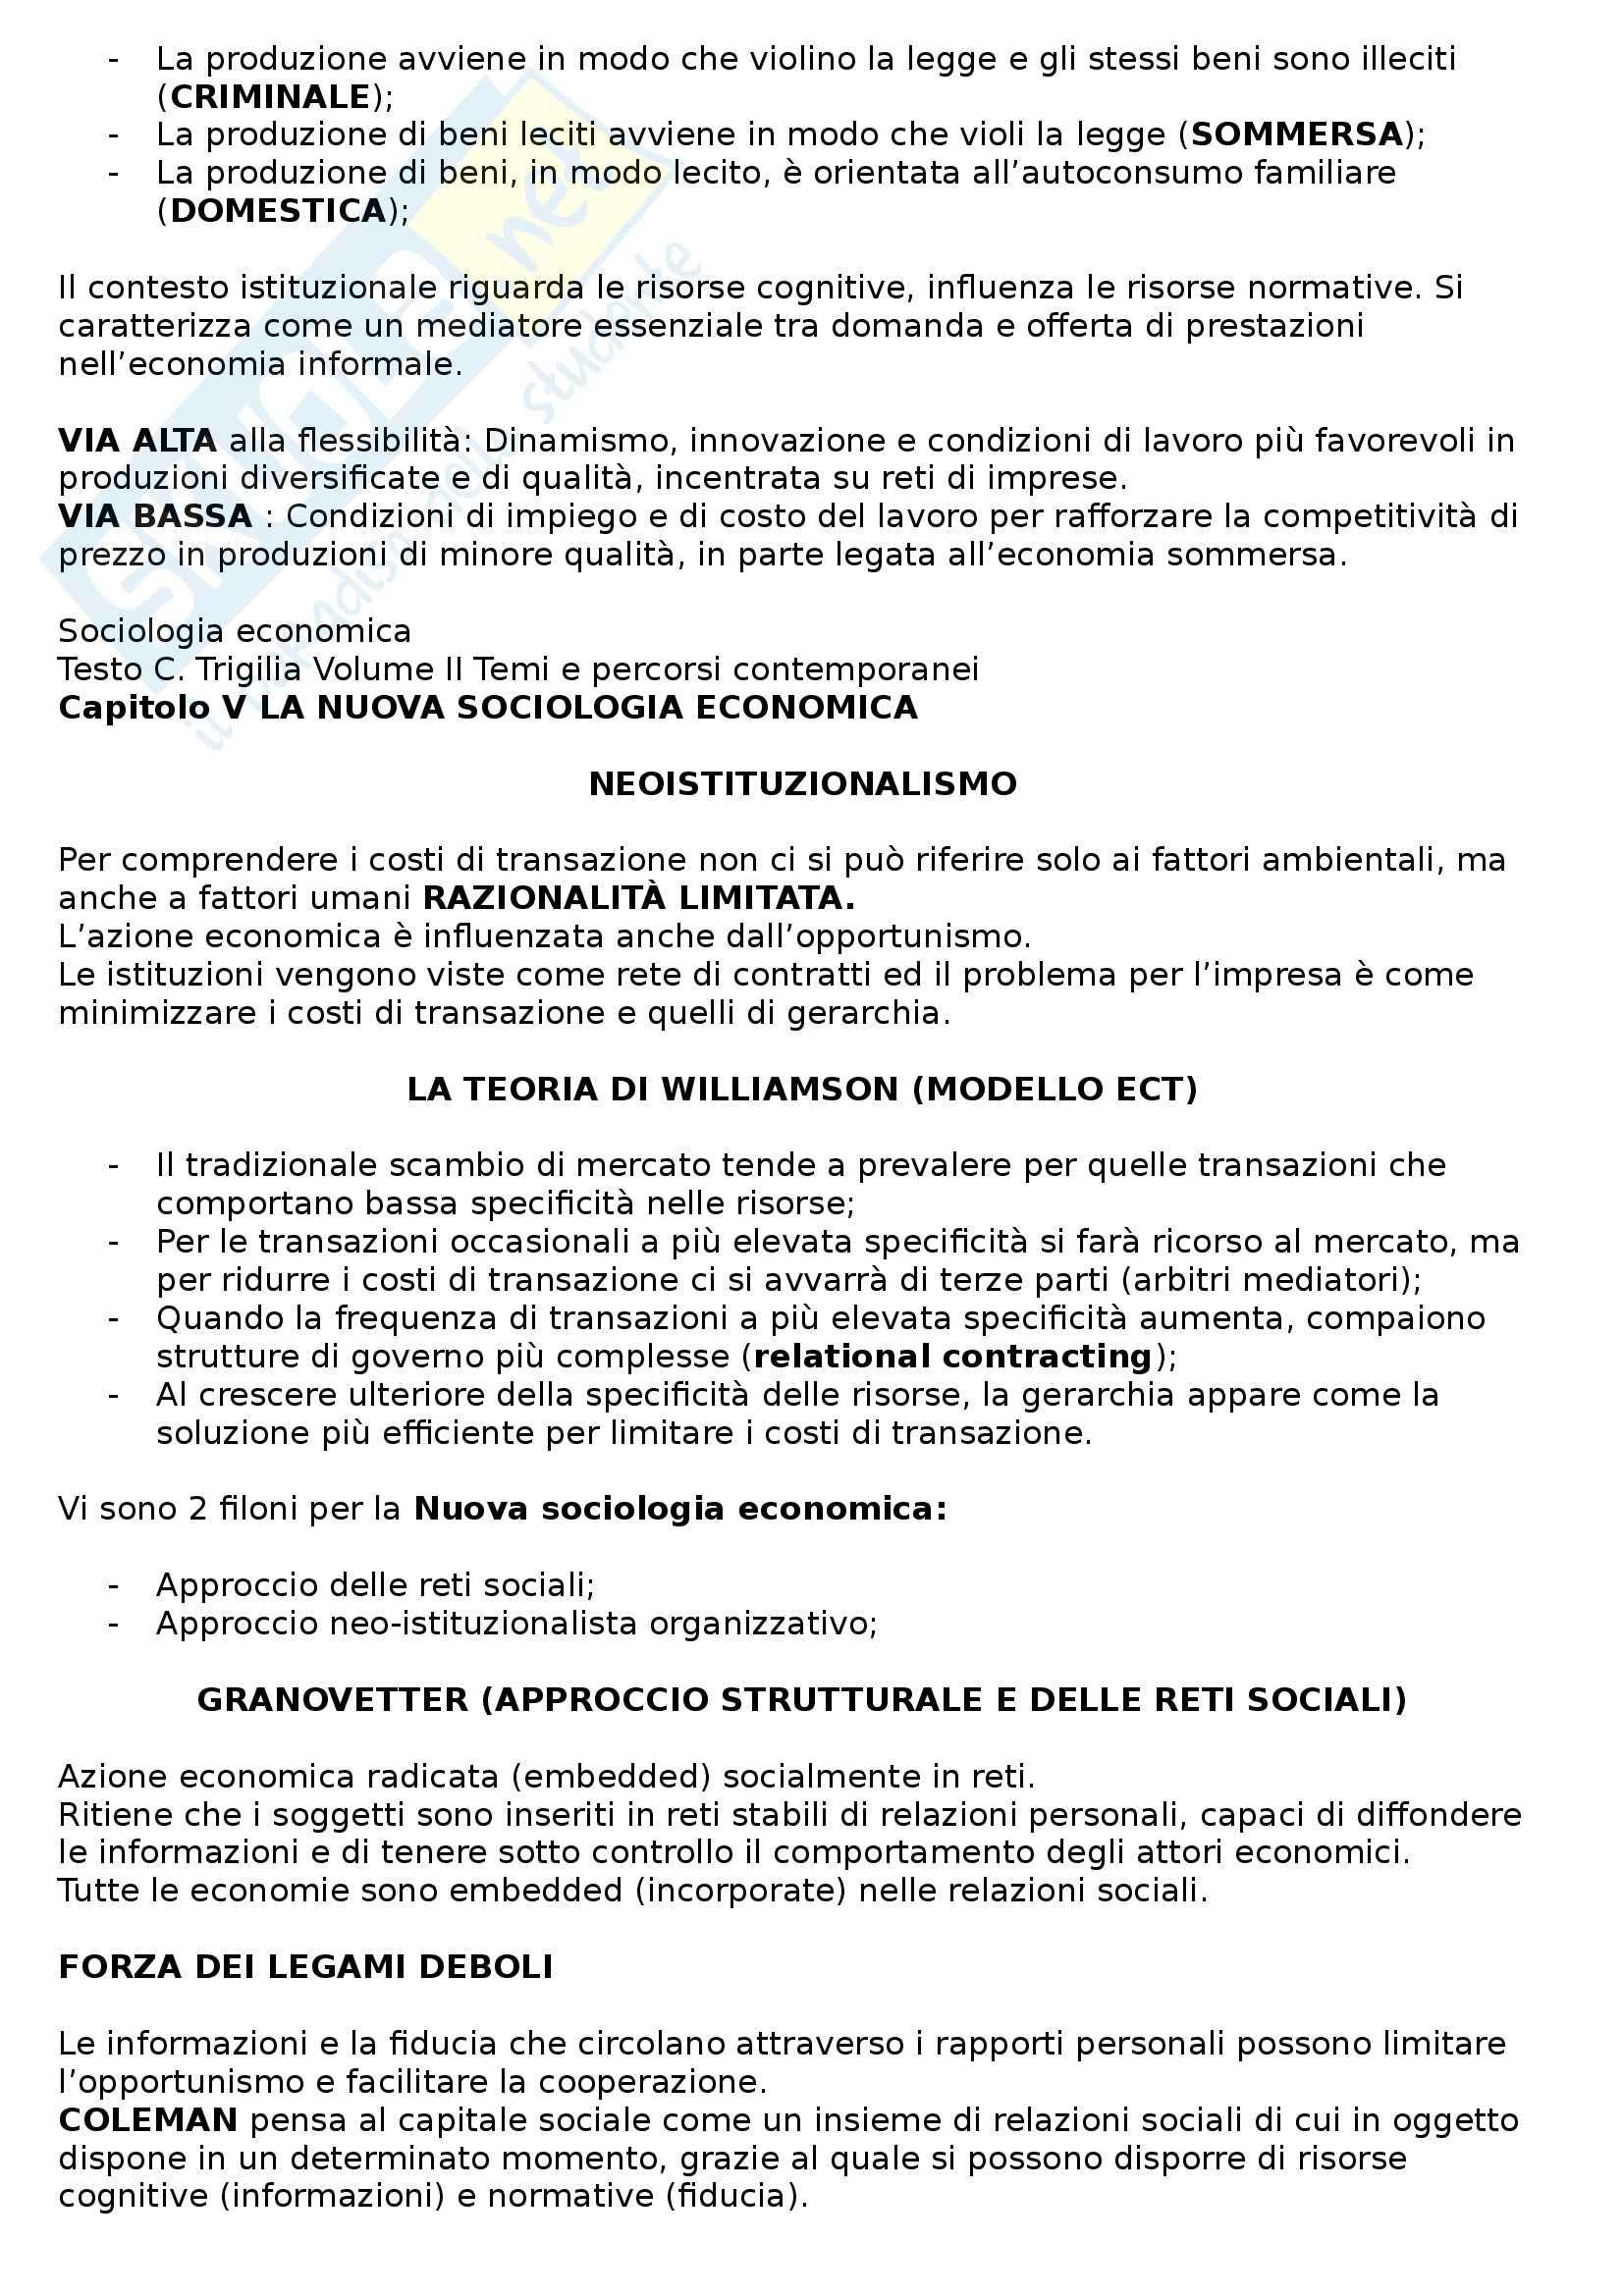 Riassunto esame Sociologia economica, prof. Pavolini, libro consigliato Sociologia economica,Volume II, Trigilia Pag. 6